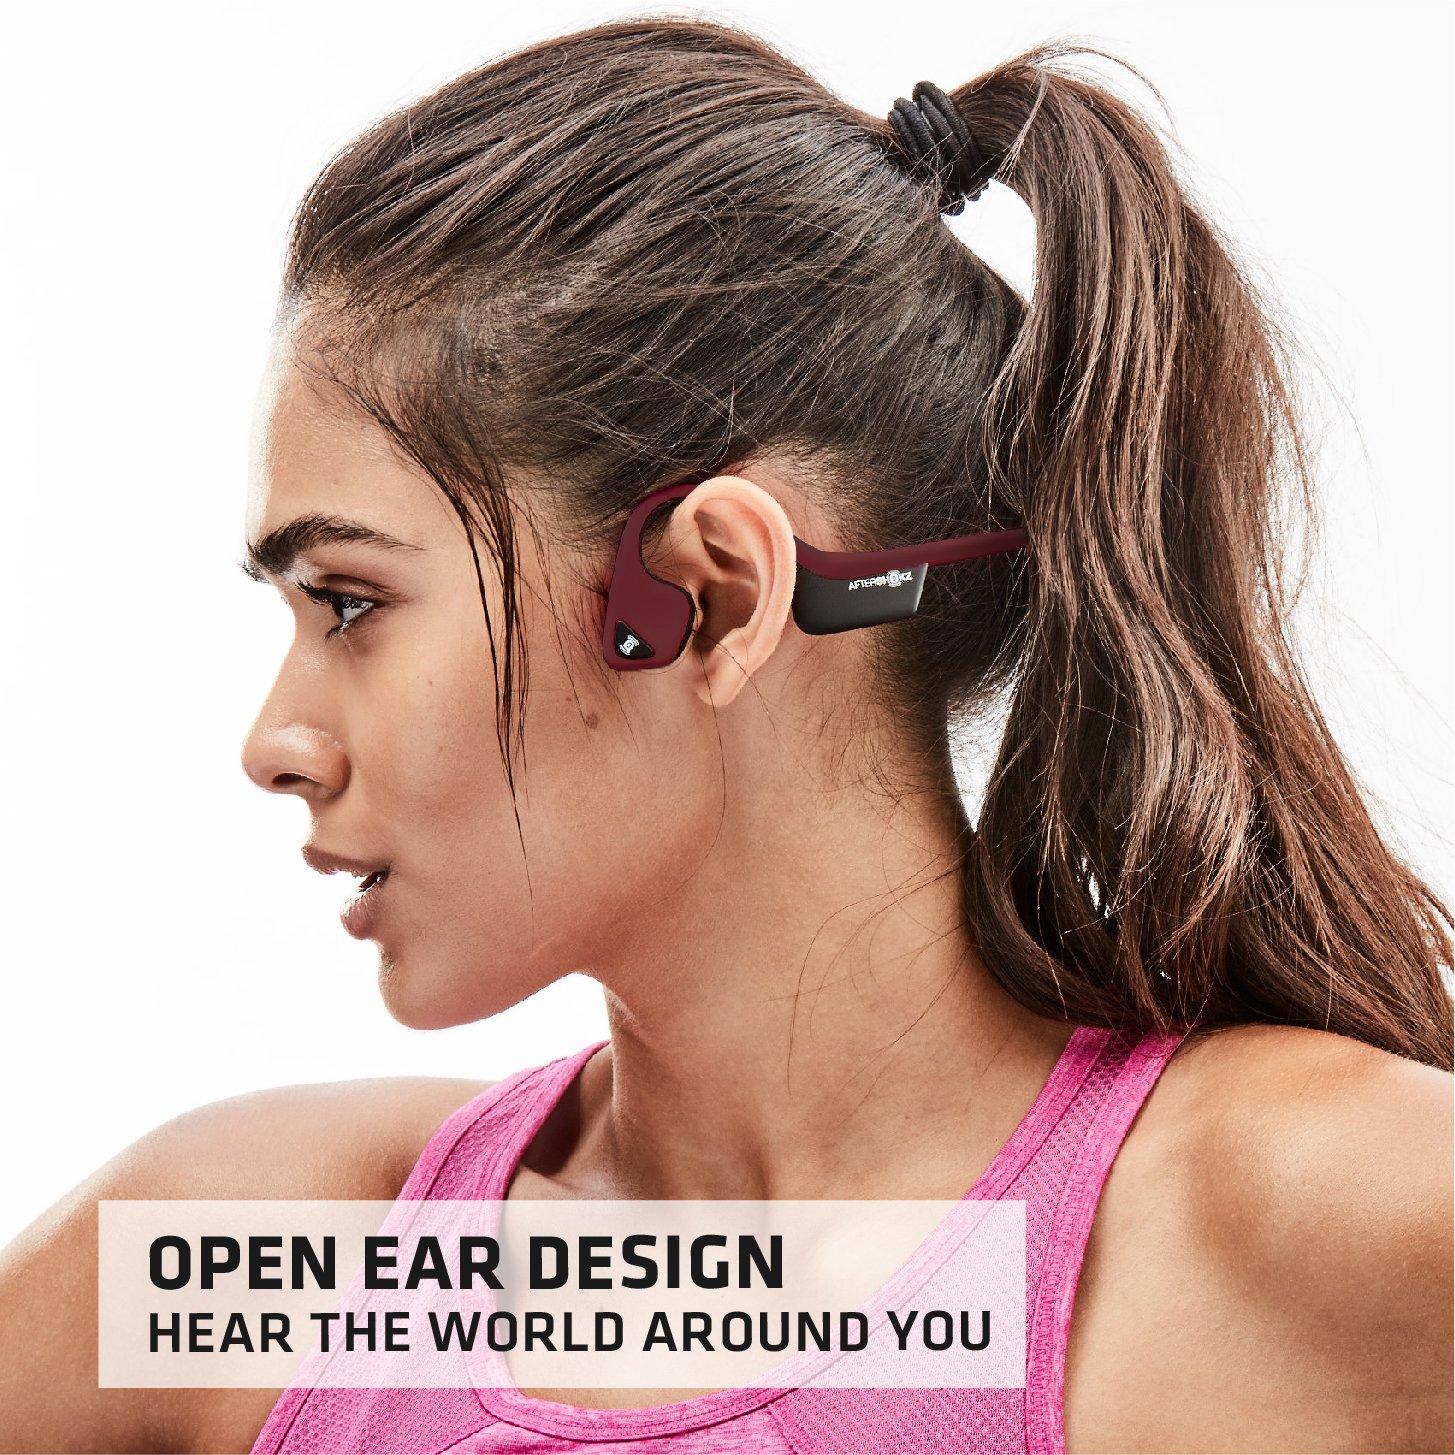 AfterShokz Trekz Air Open Ear Wireless Bone Conduction Headphones AS650SG Slate Grey